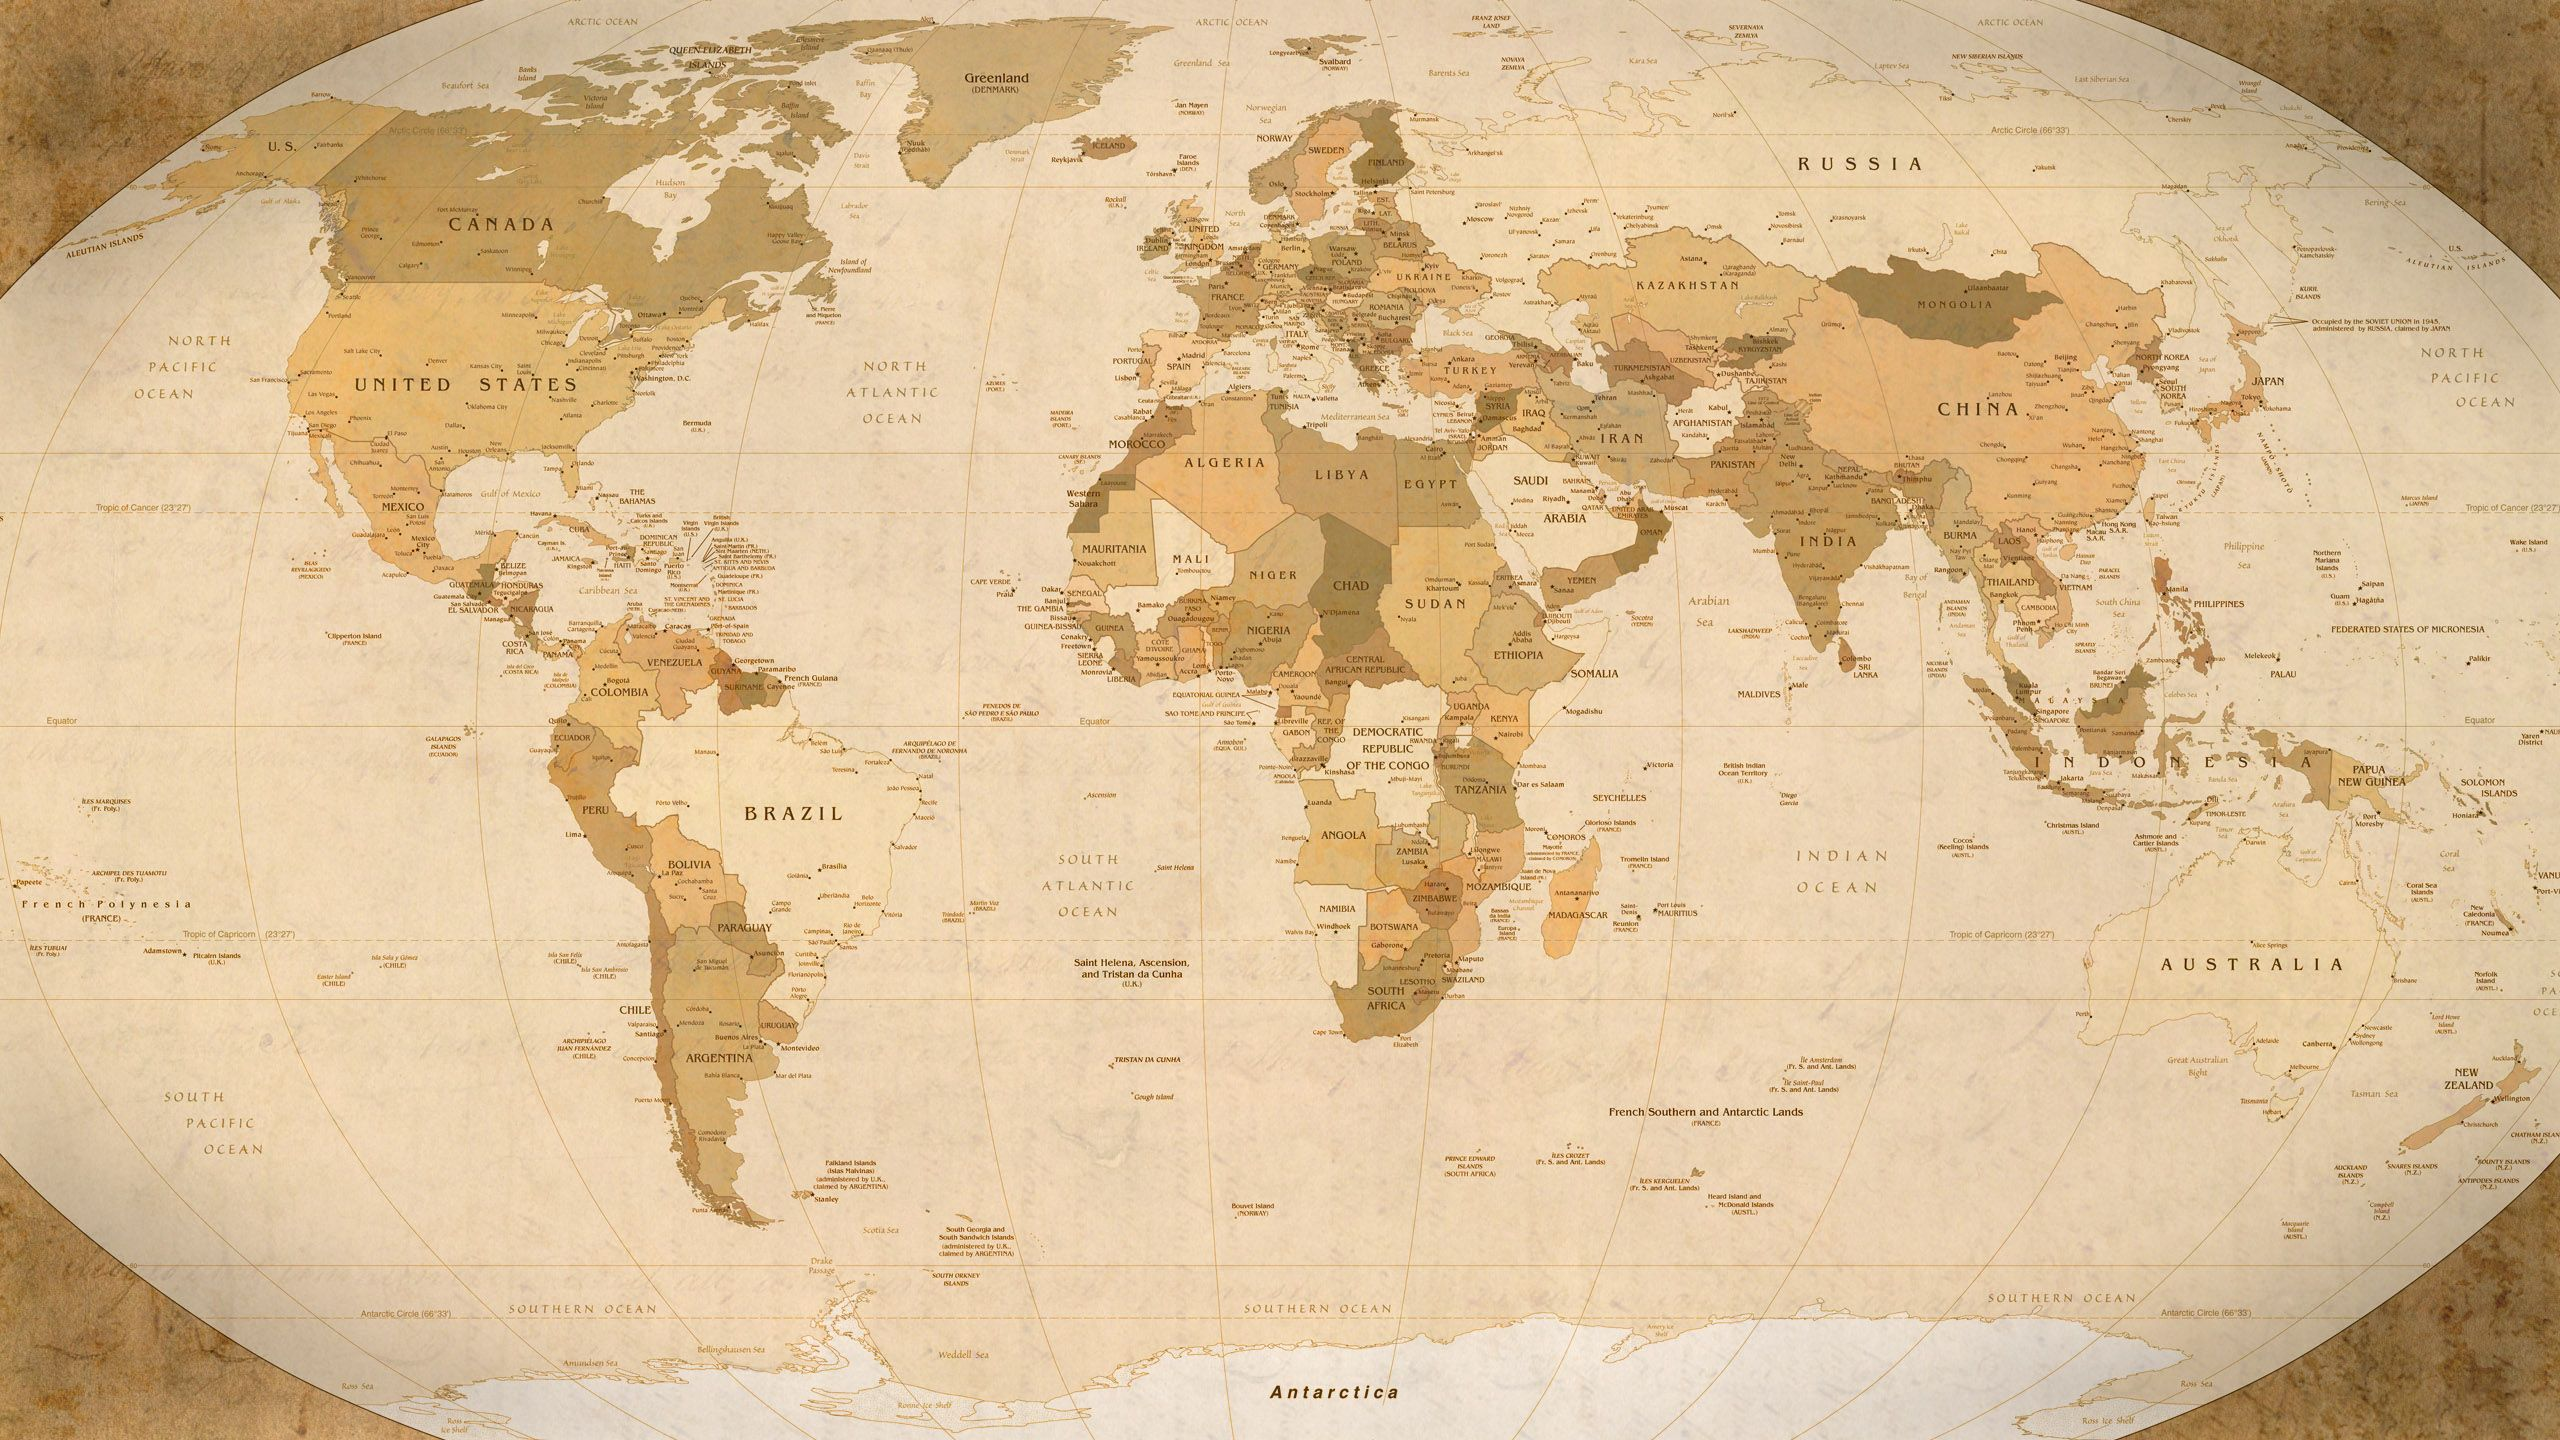 World map wallpaper by maps international hd wallpapers world map wallpaper by maps international gumiabroncs Gallery